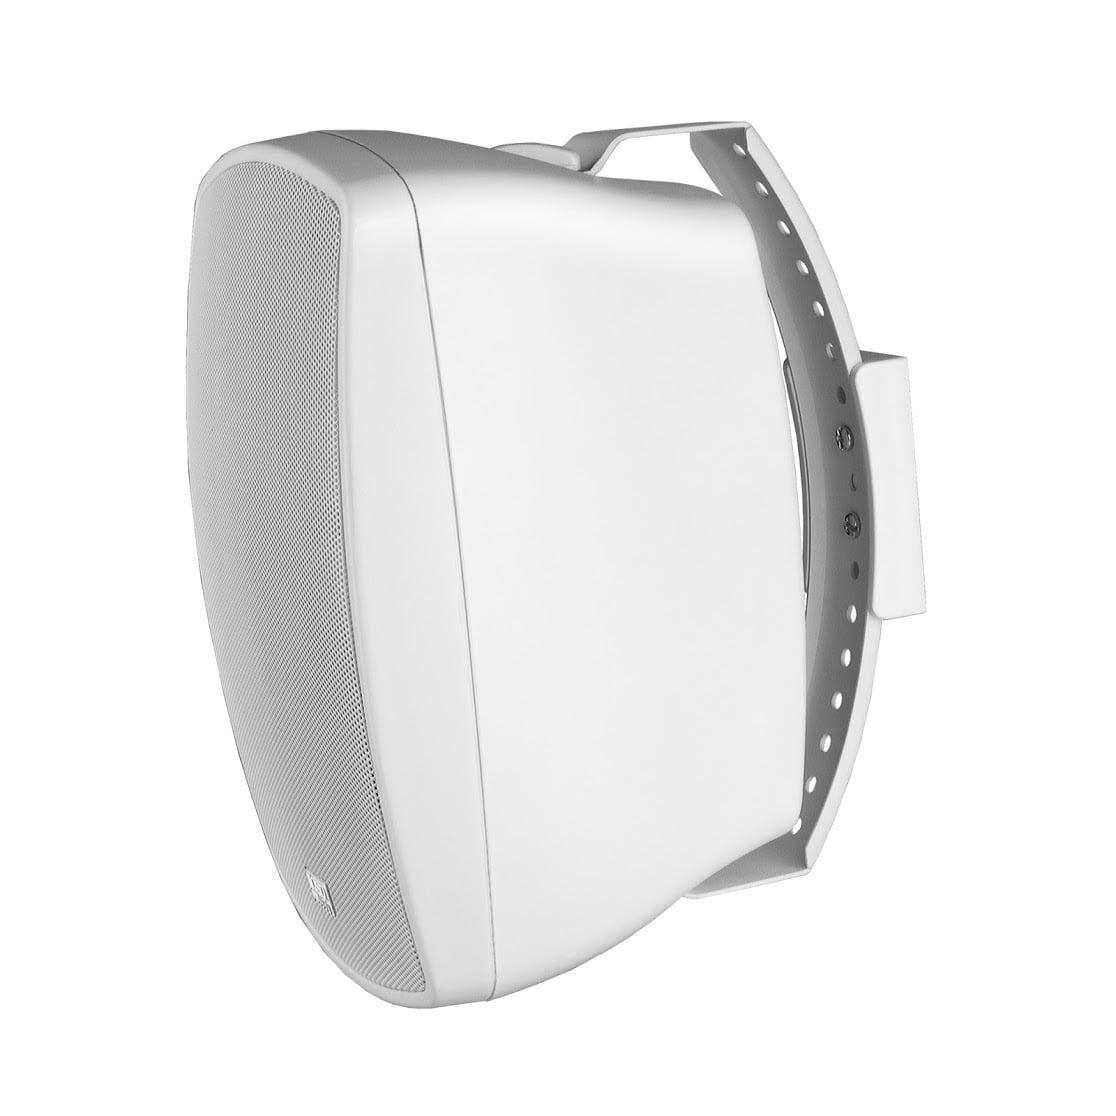 Btp650 Wireless 6 5 Bluetooth 2 Way Outdoor Patio Speaker Pair Composite Resin Low Resonator Cabinet Ip67 Waterproof Supply White